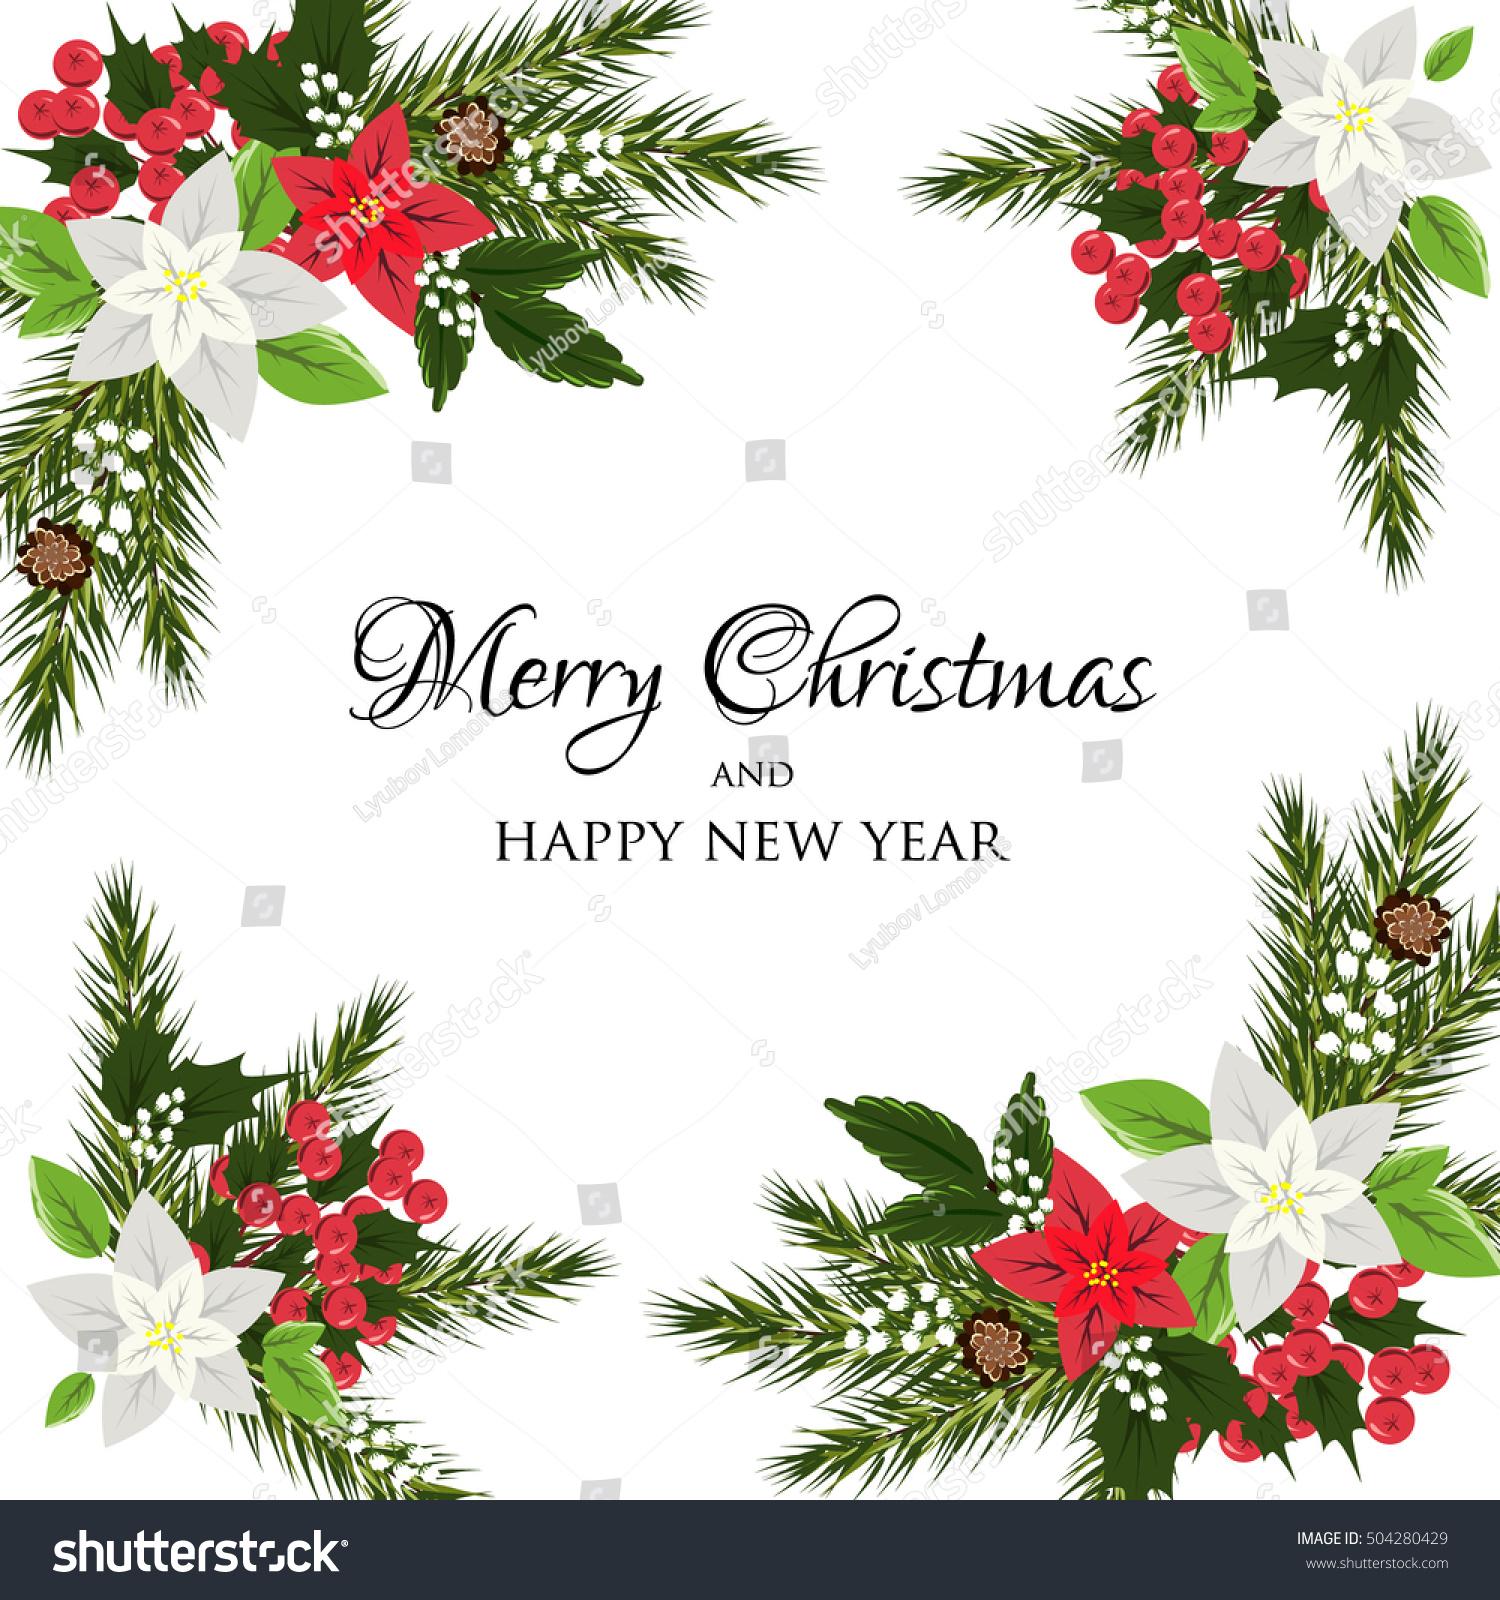 christmas party invitation holiday wreath poinsettia stock